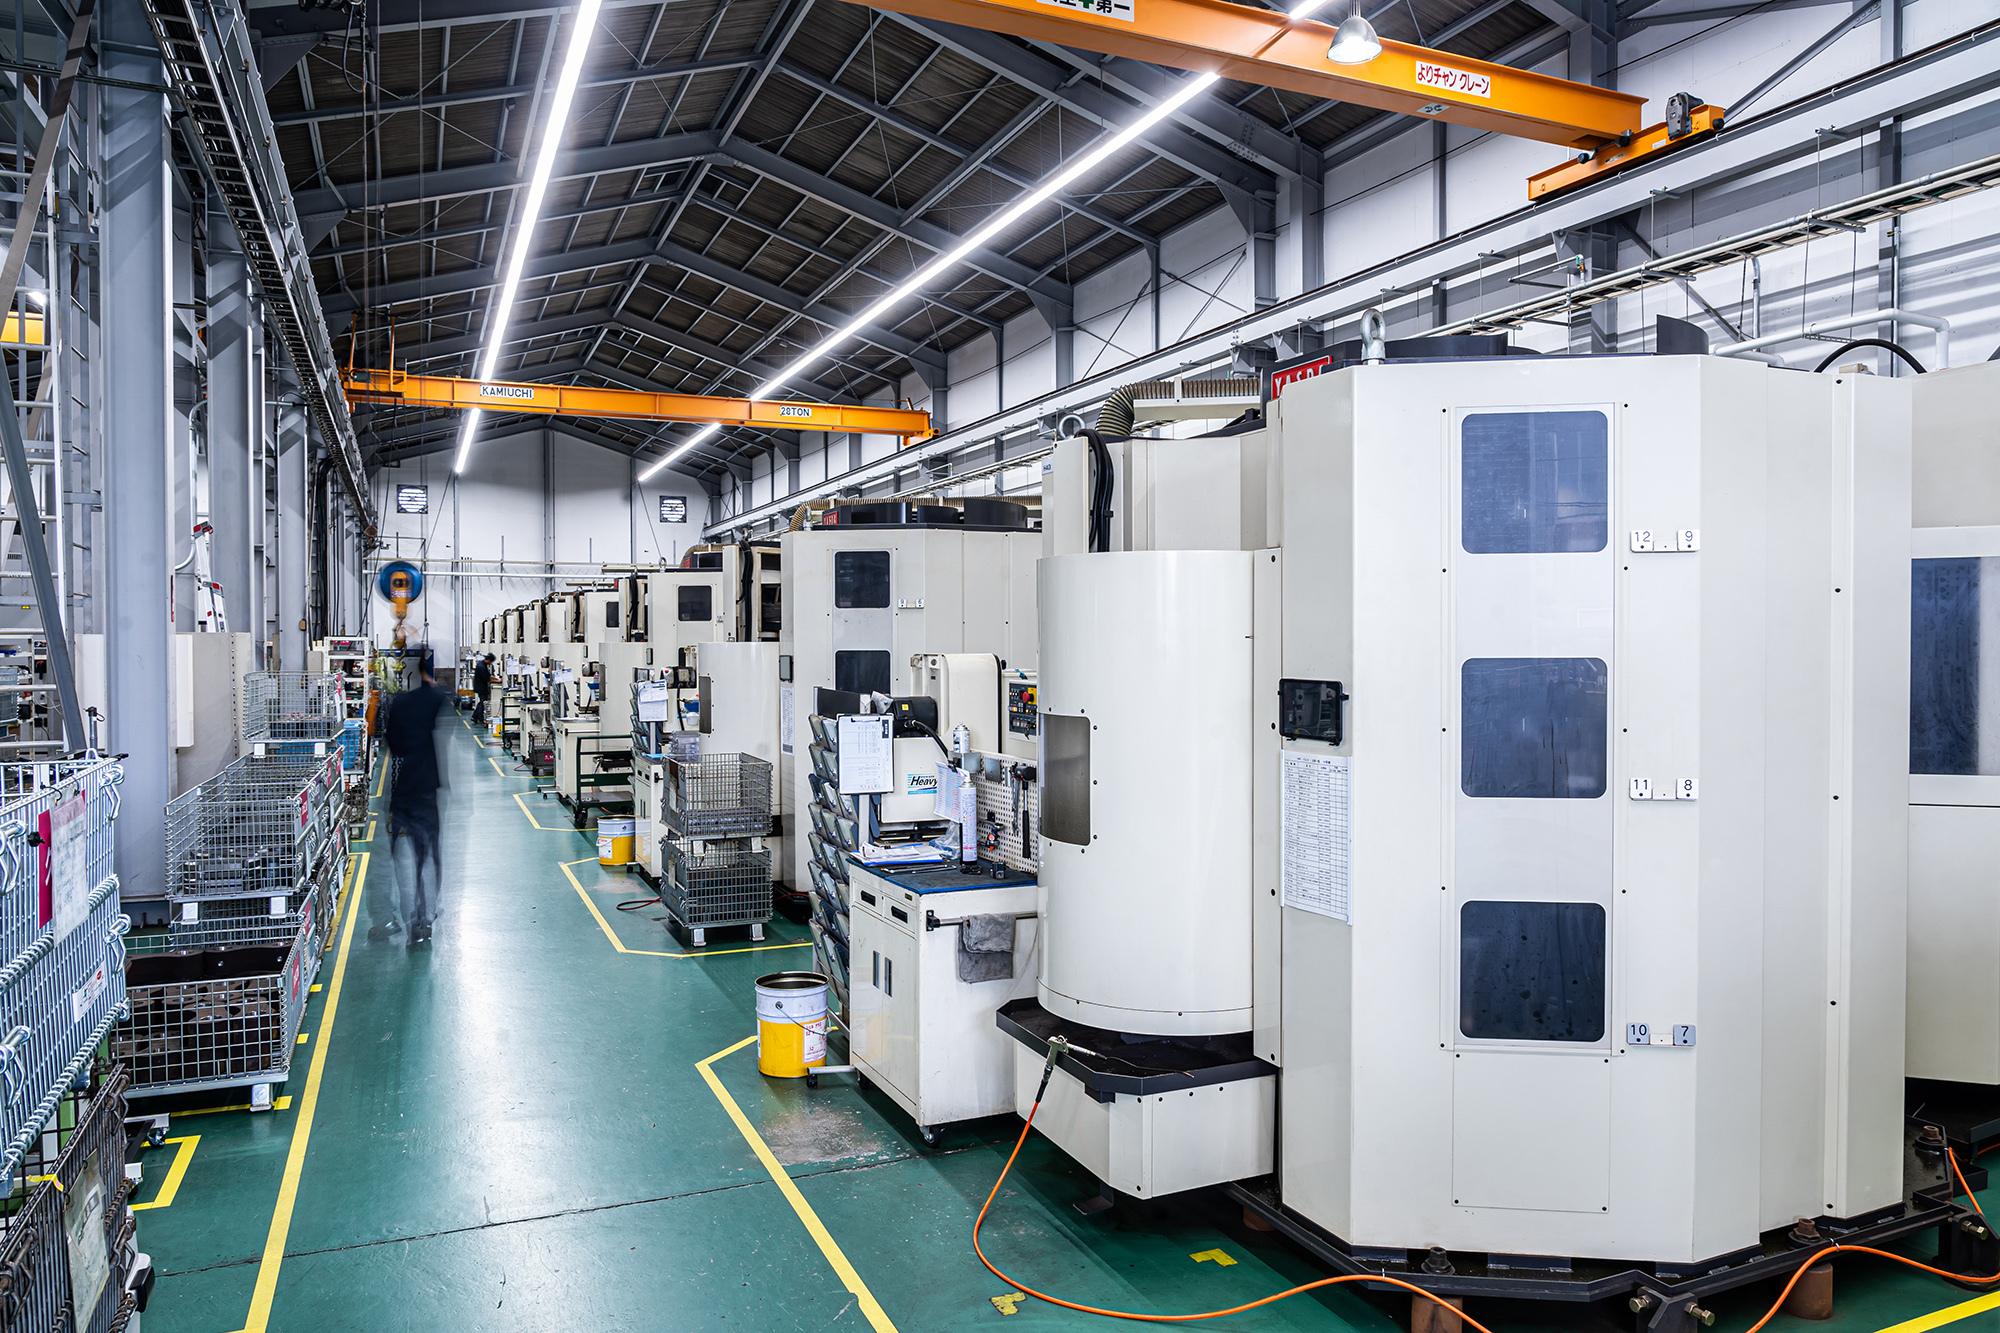 タグチ工業 大山工場導入予定の工作機械